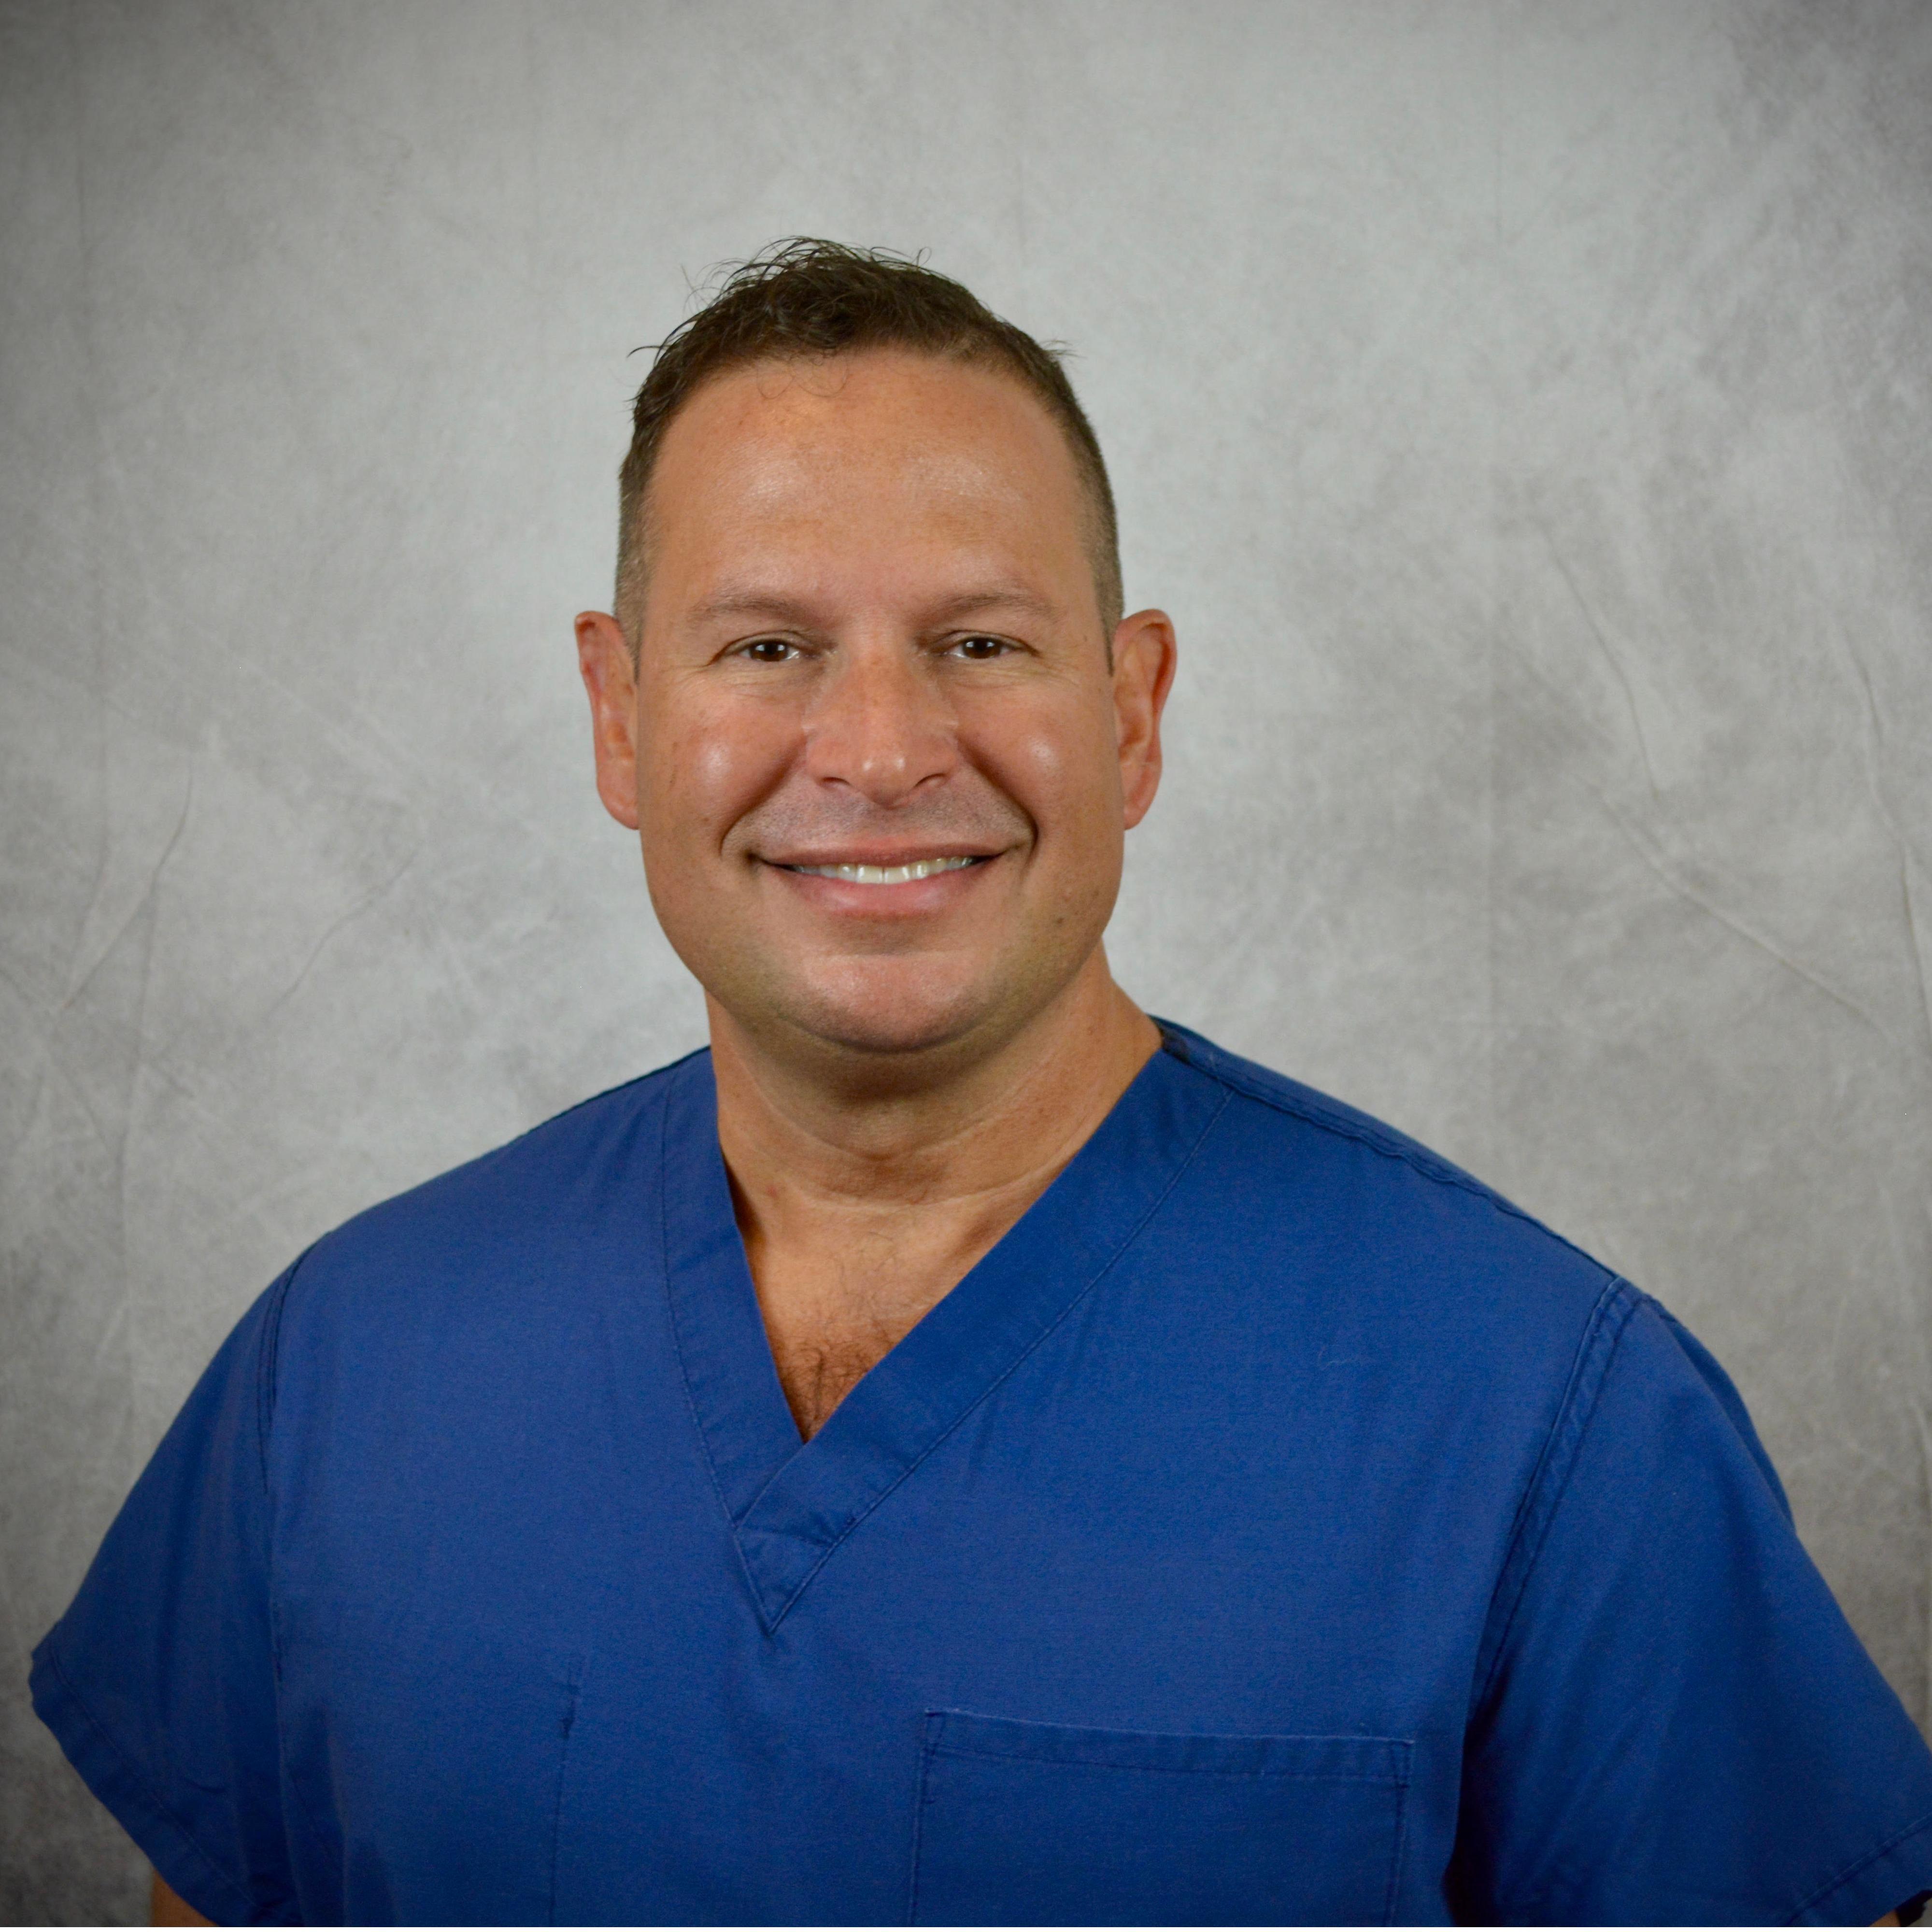 Ozark OB/GYN: Donald Jones, MD, FACOG